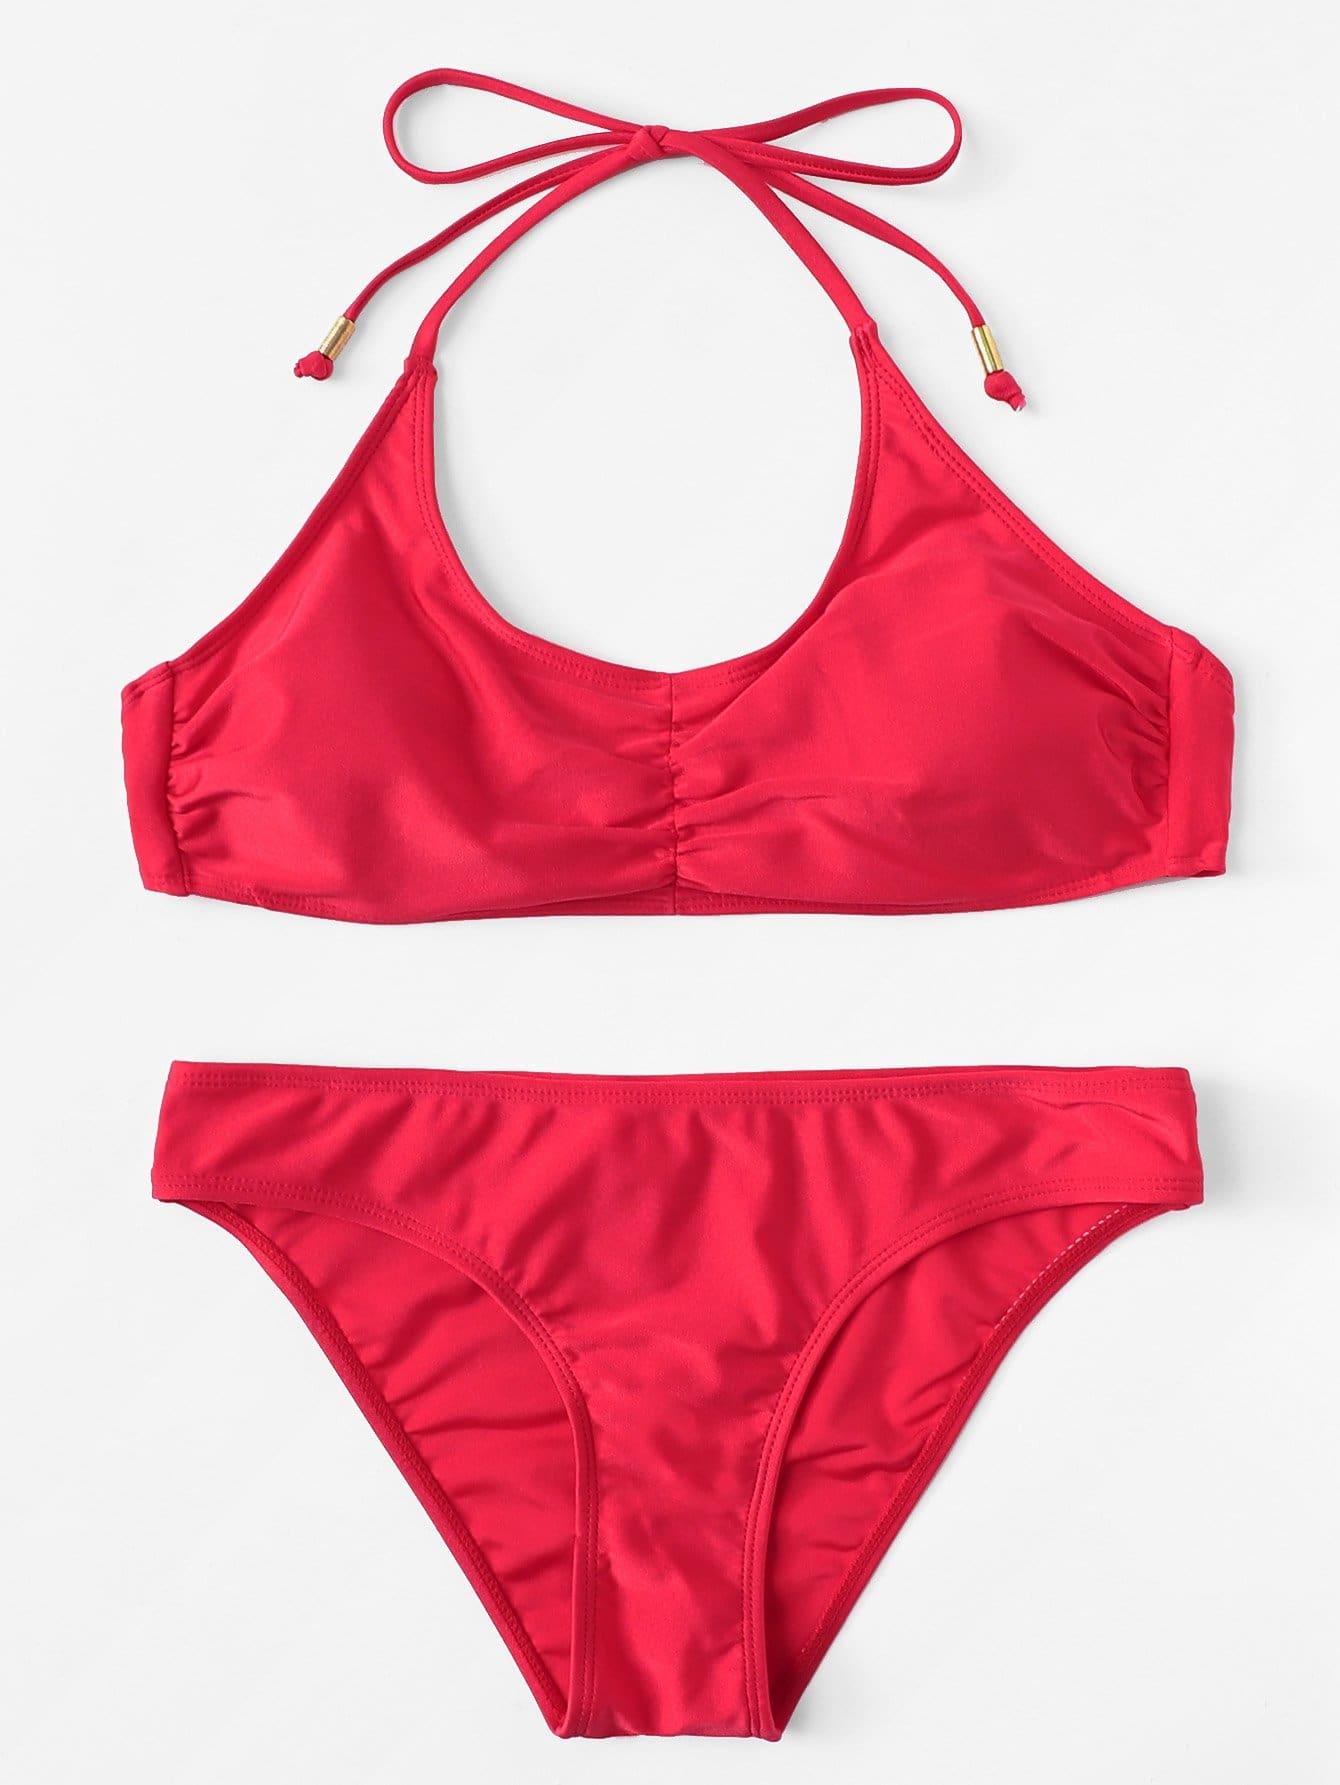 Ruched Detail Halterneck Bikini Set ruched detail halter bikini set